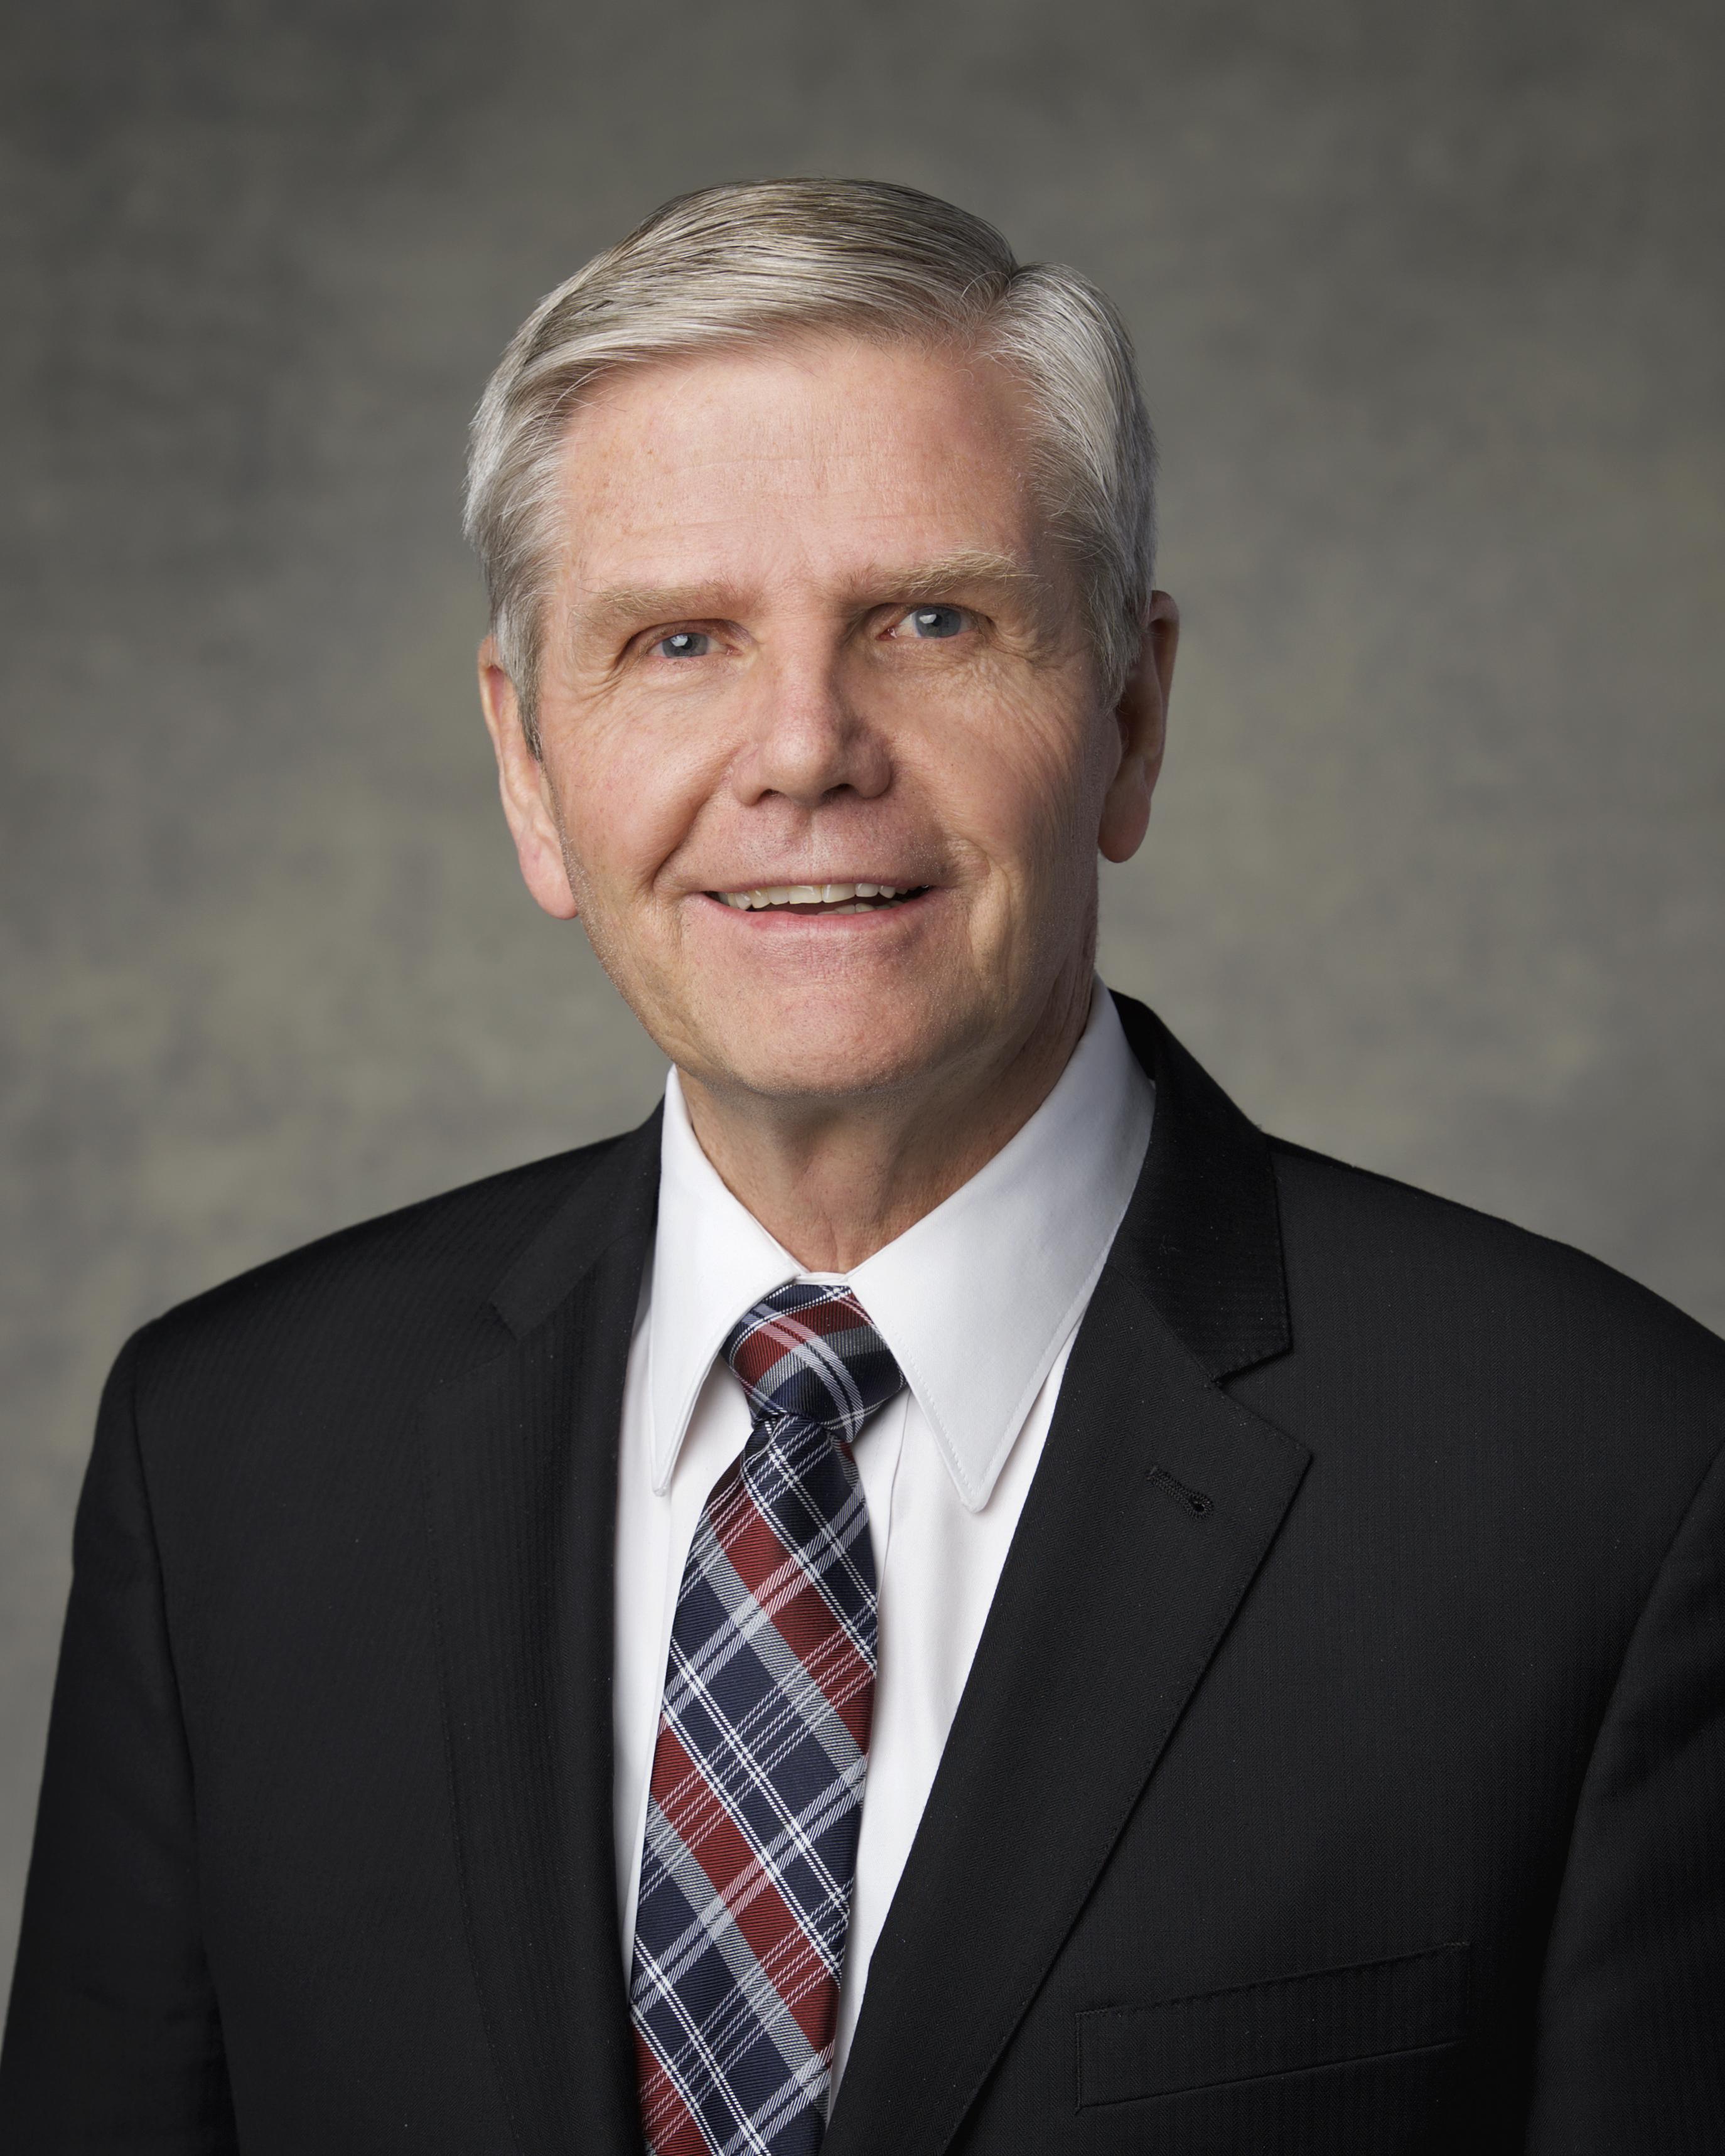 Elder Mervyn B. Arnold, emeritus General Authority Seventy